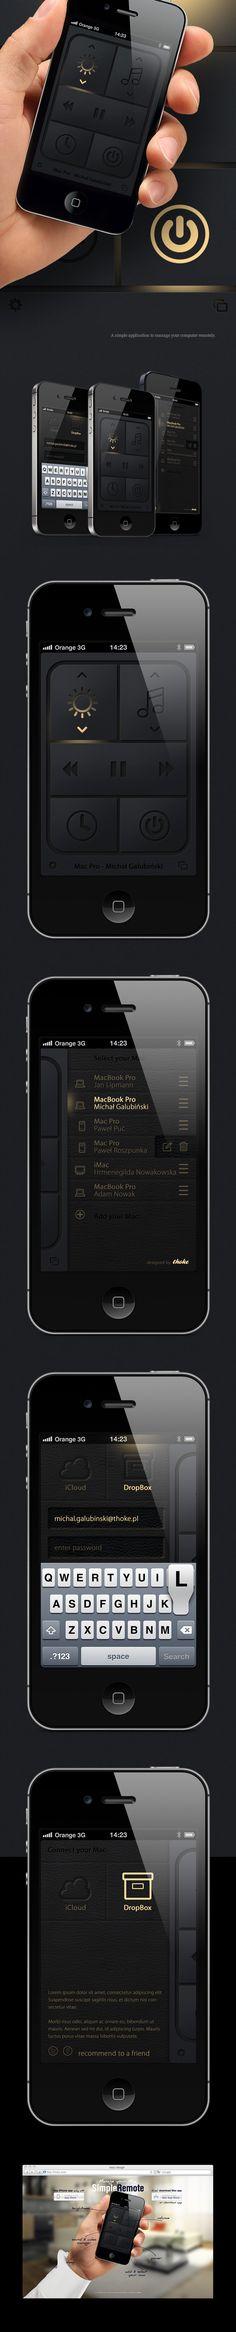 simple mac remote by Michal Galubinski, via Behance